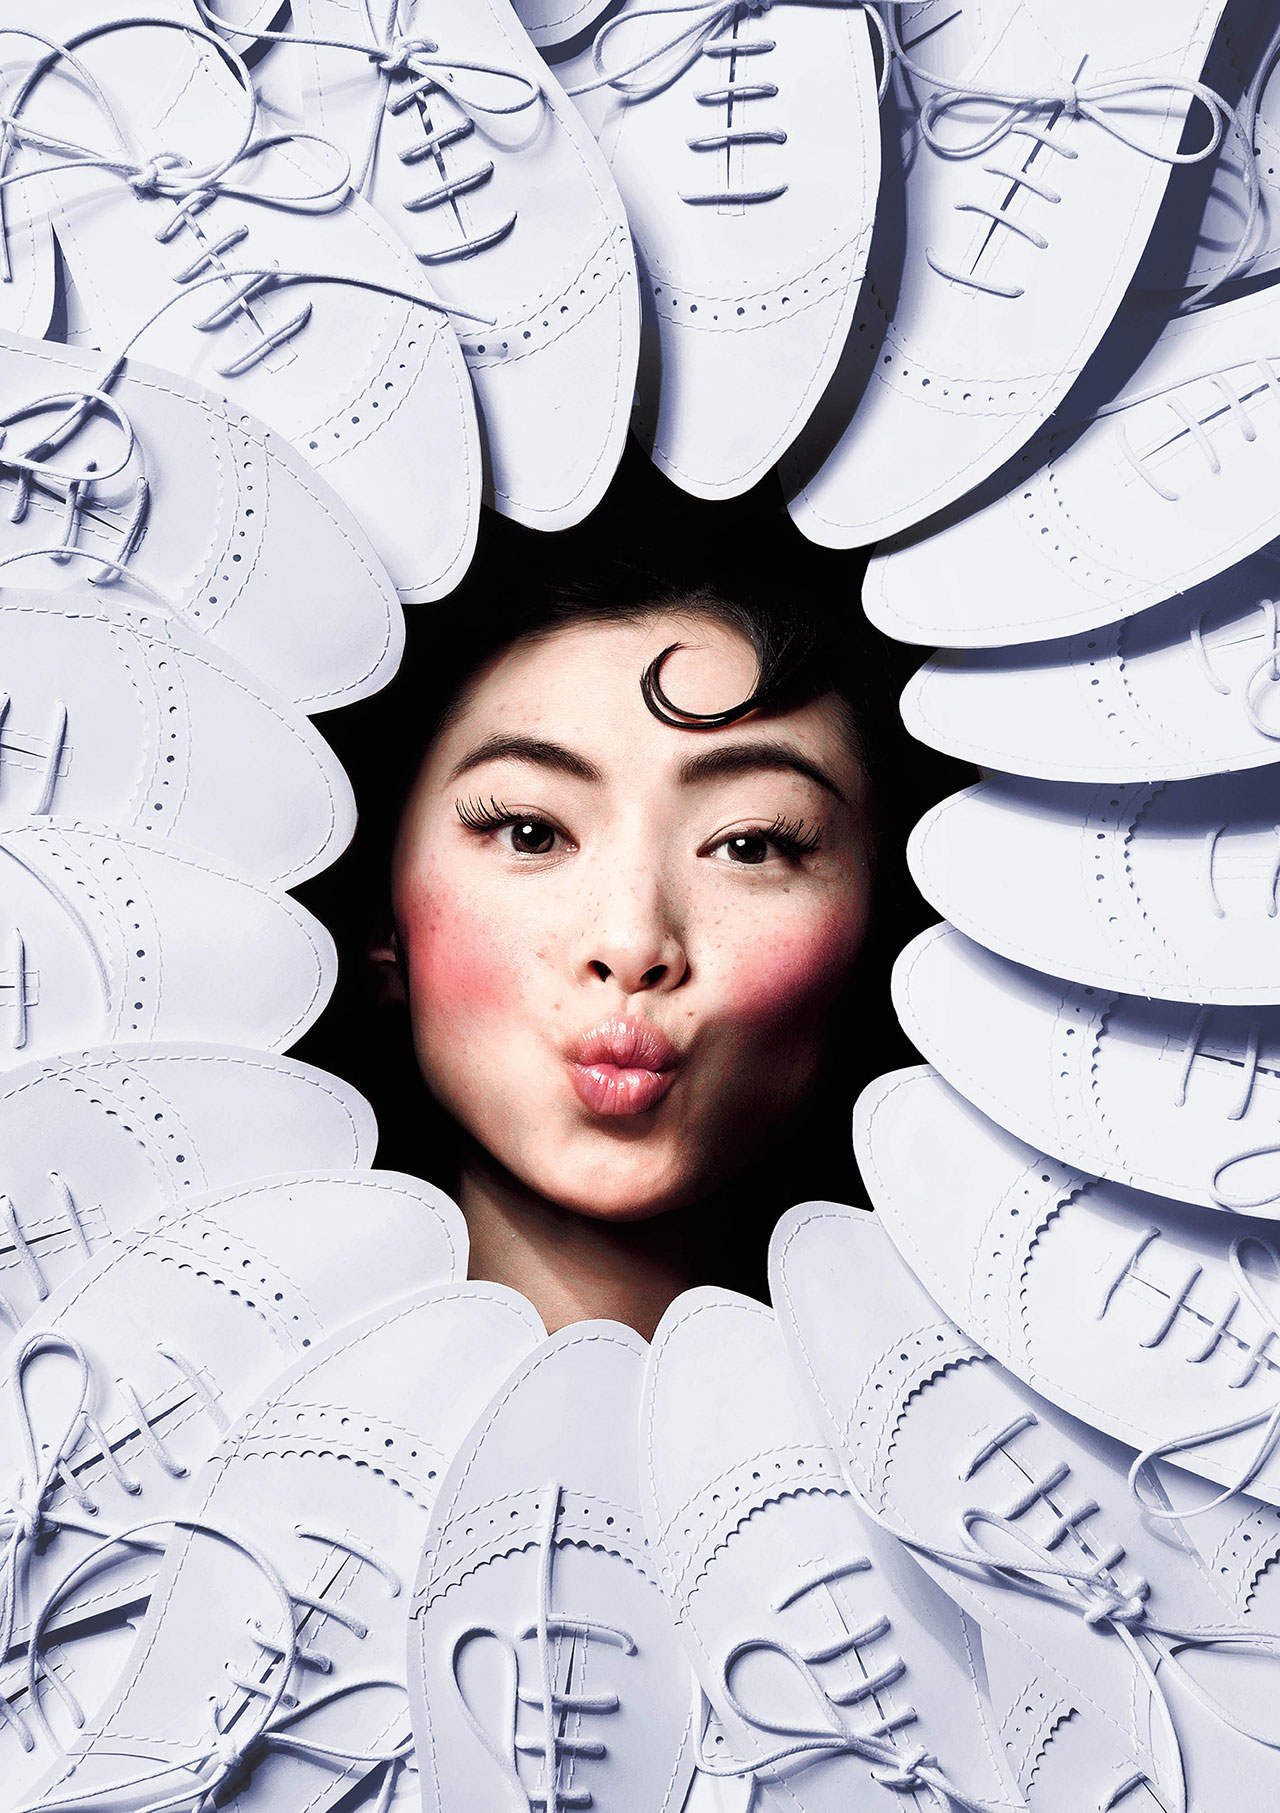 Bea Szenfeld Dresses the Royal Swedish Opera Company with 'Haute Papier'